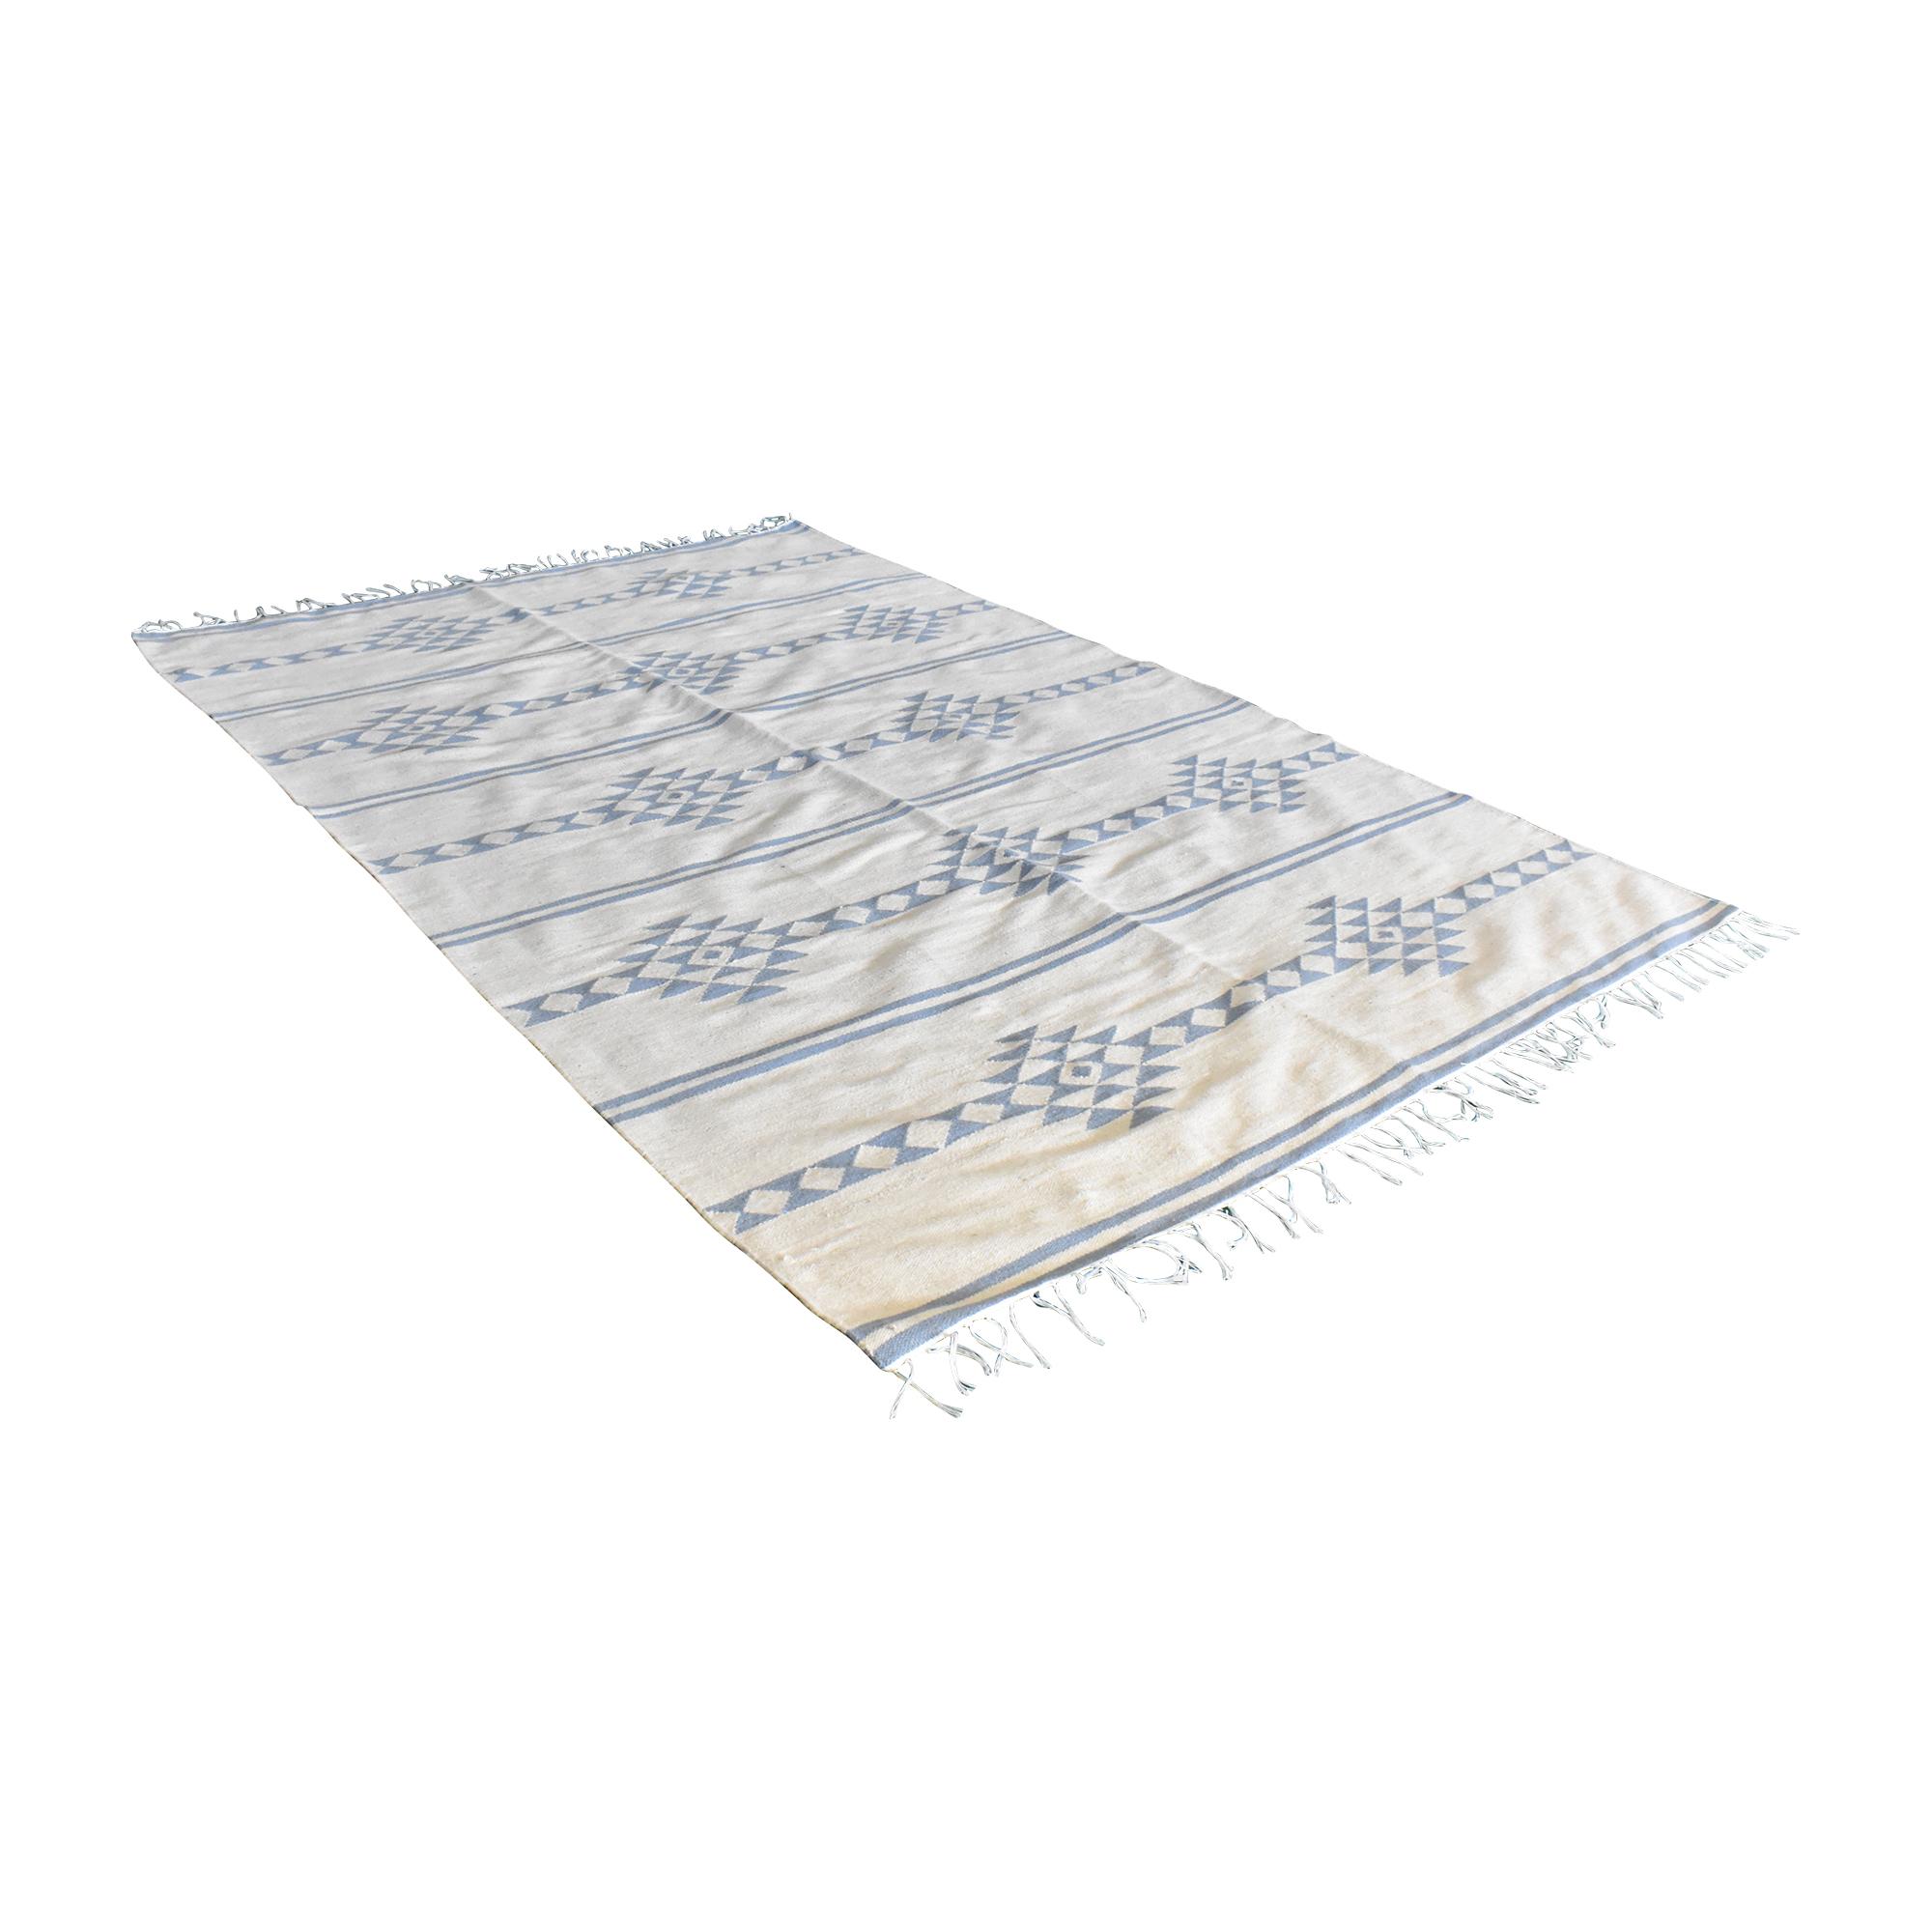 Kilim Kilim Striped Area Rug discount